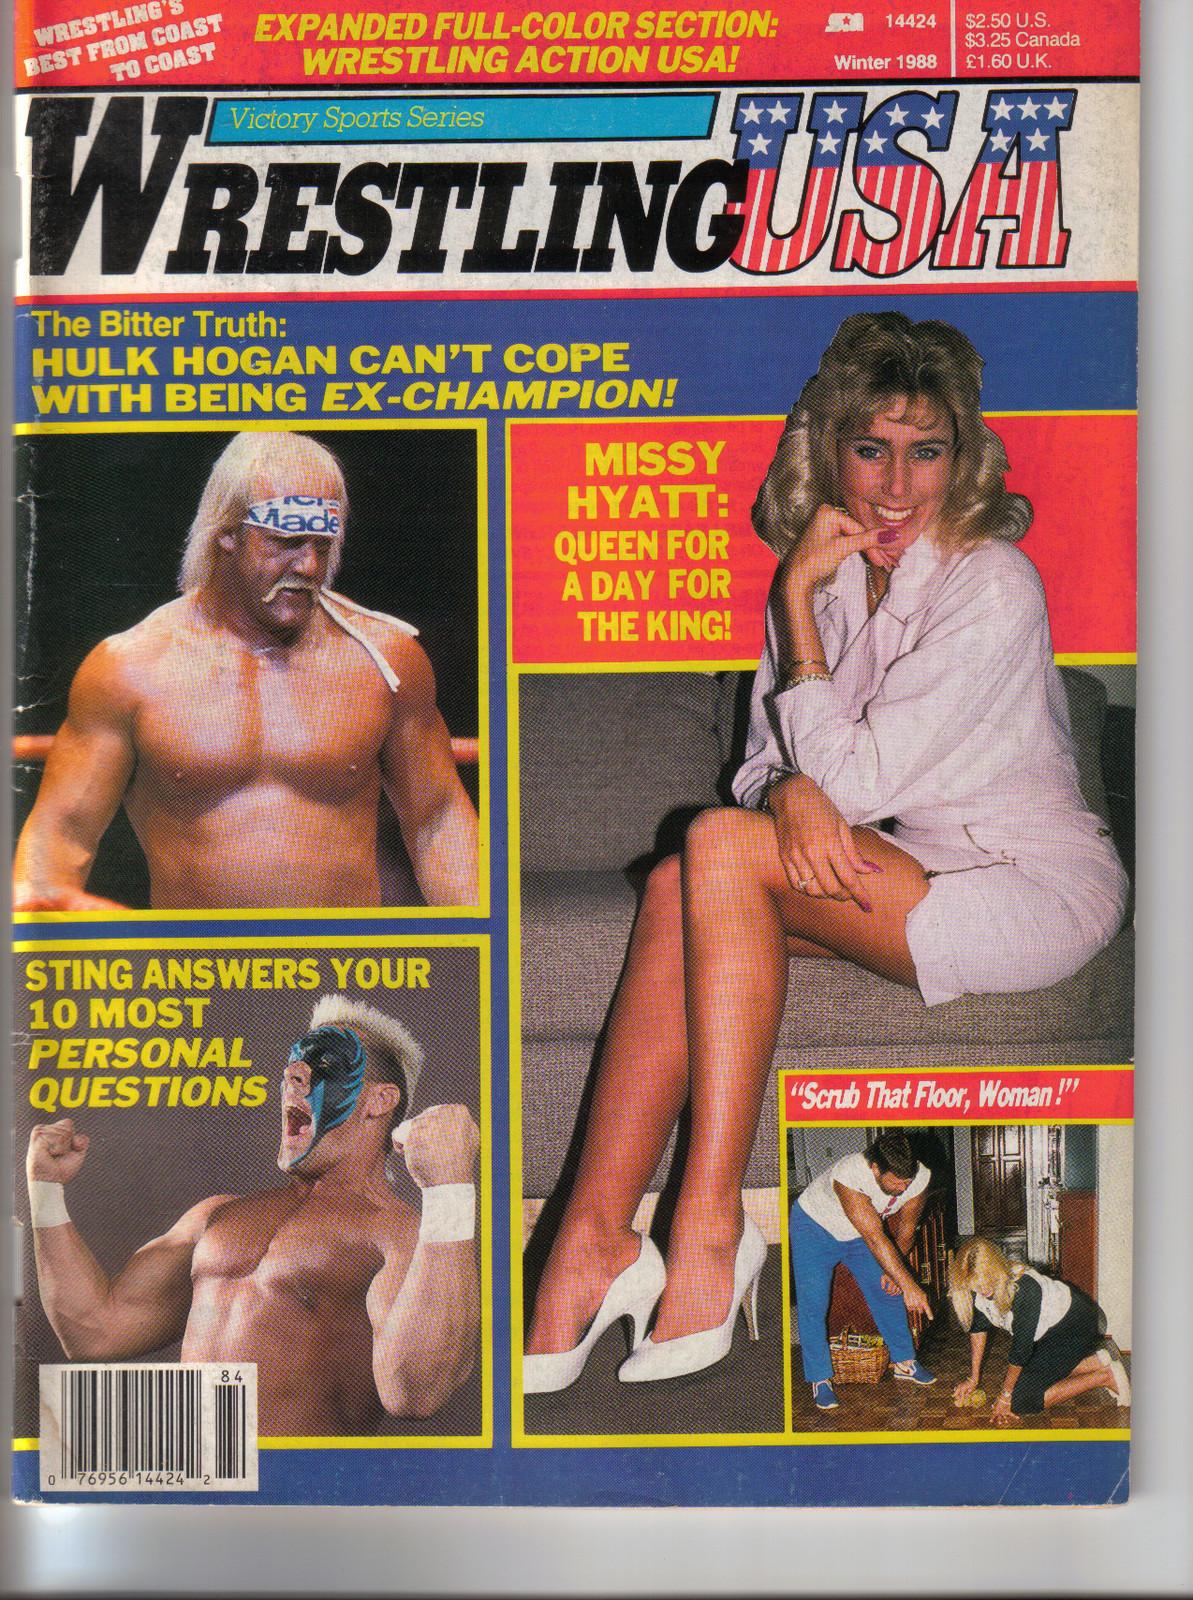 Wrestling USA - Winter 1988